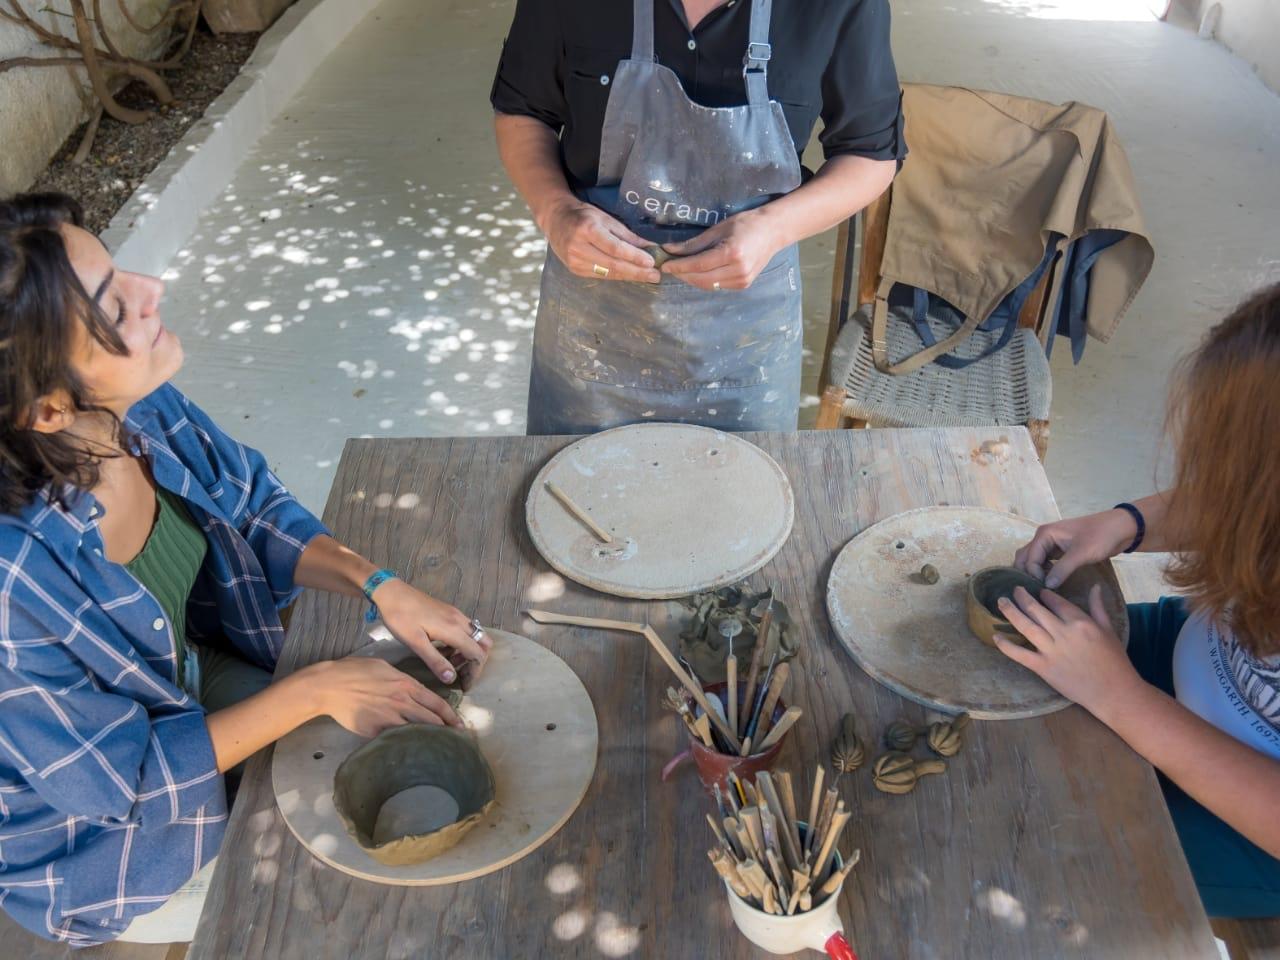 Five-day Ceramic Workshop Margarites Village Crete, best ceramic workshop rethymno crete, ceramic workshop rethimno crete, activities rethimno crete, art creativity workshop crete, things to do crete, best ceramic studio rethimno crete, ea ceramic workshops